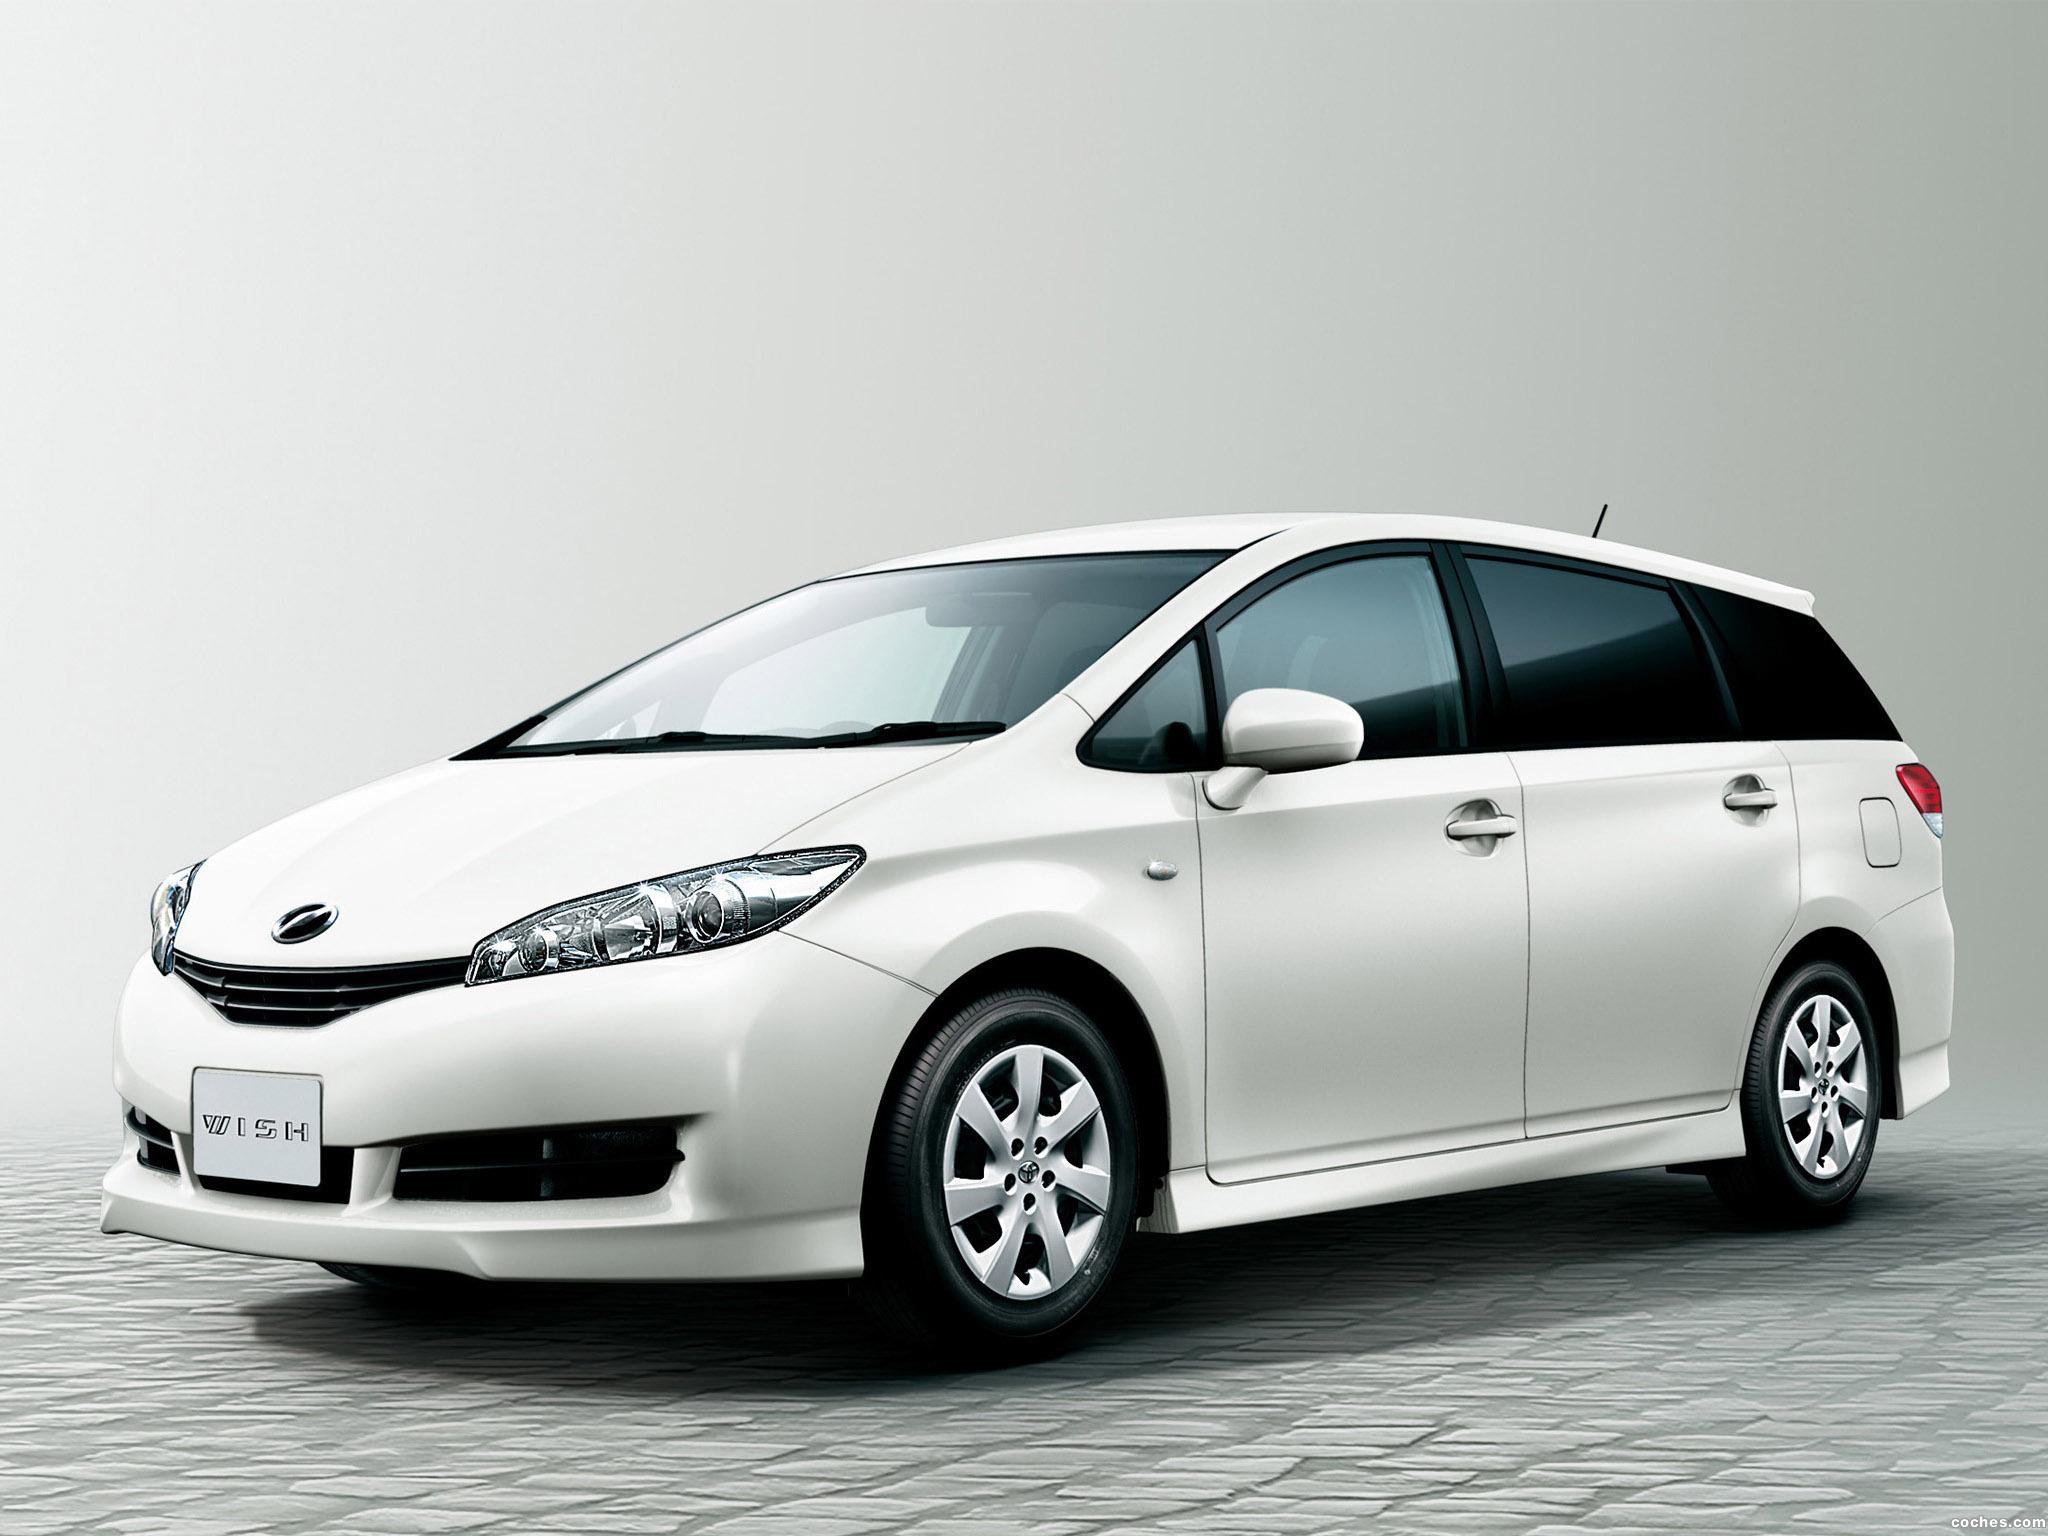 Foto 0 de Toyota Wish 2009